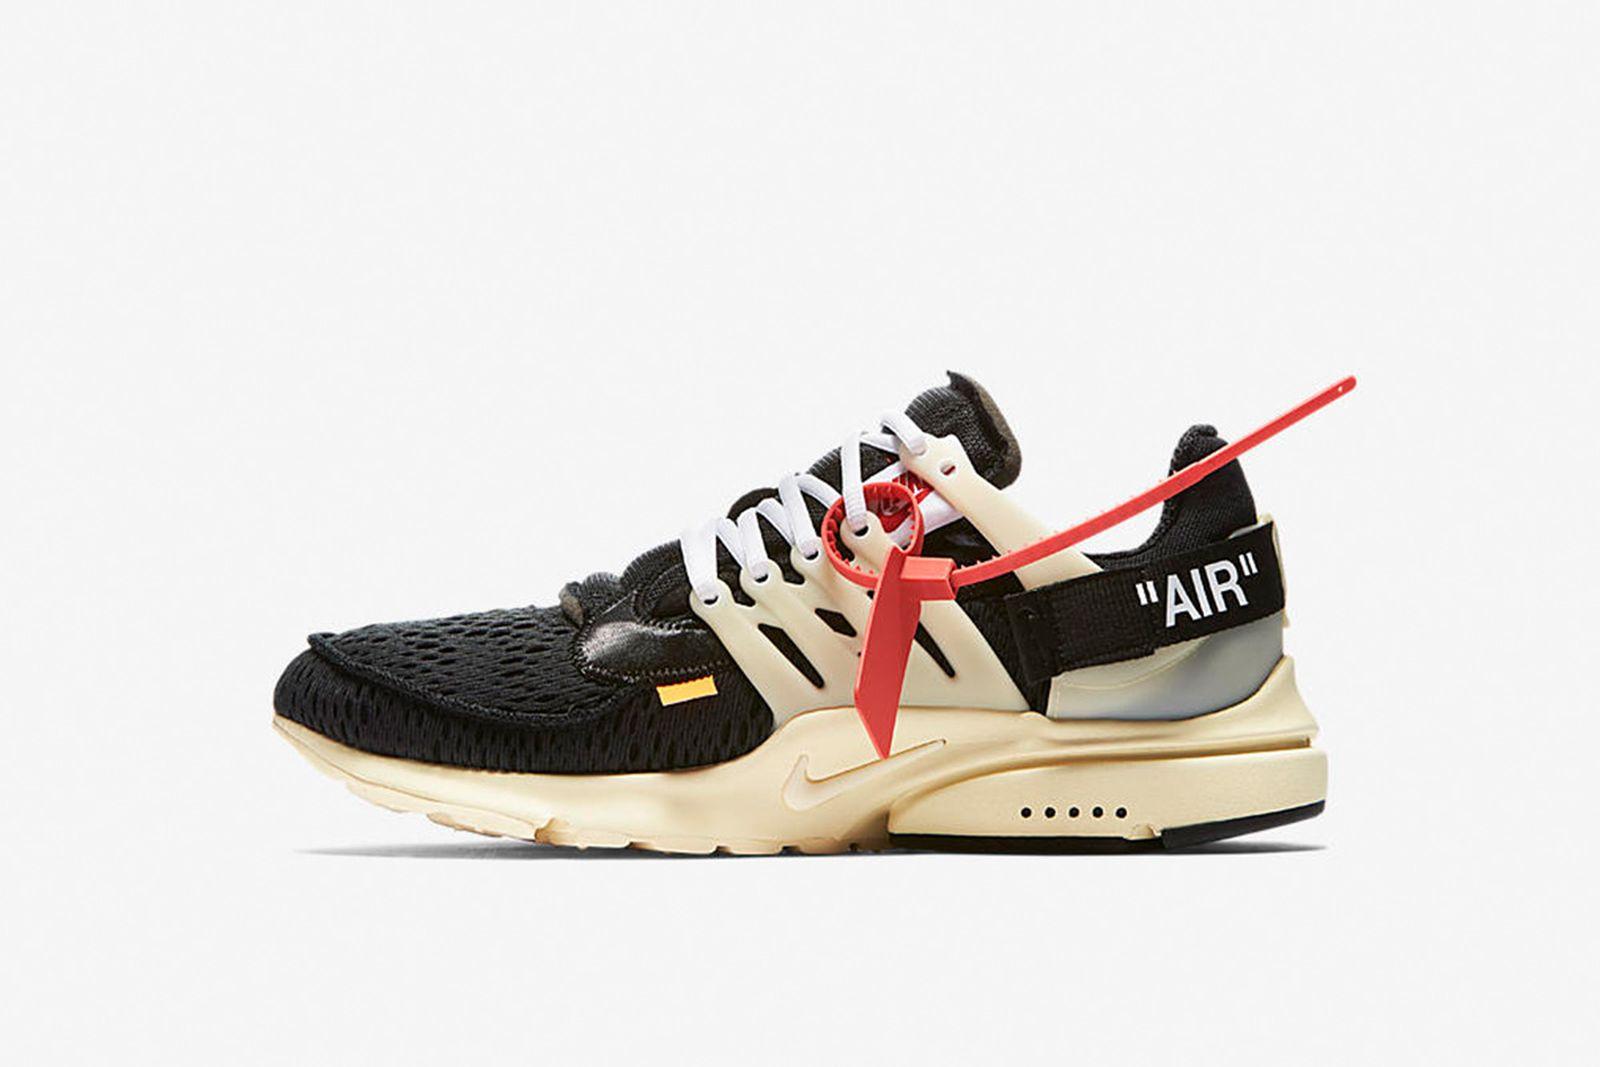 presto GOAT Nike The Ten OFF-WHITE c/o Virgil Abloh